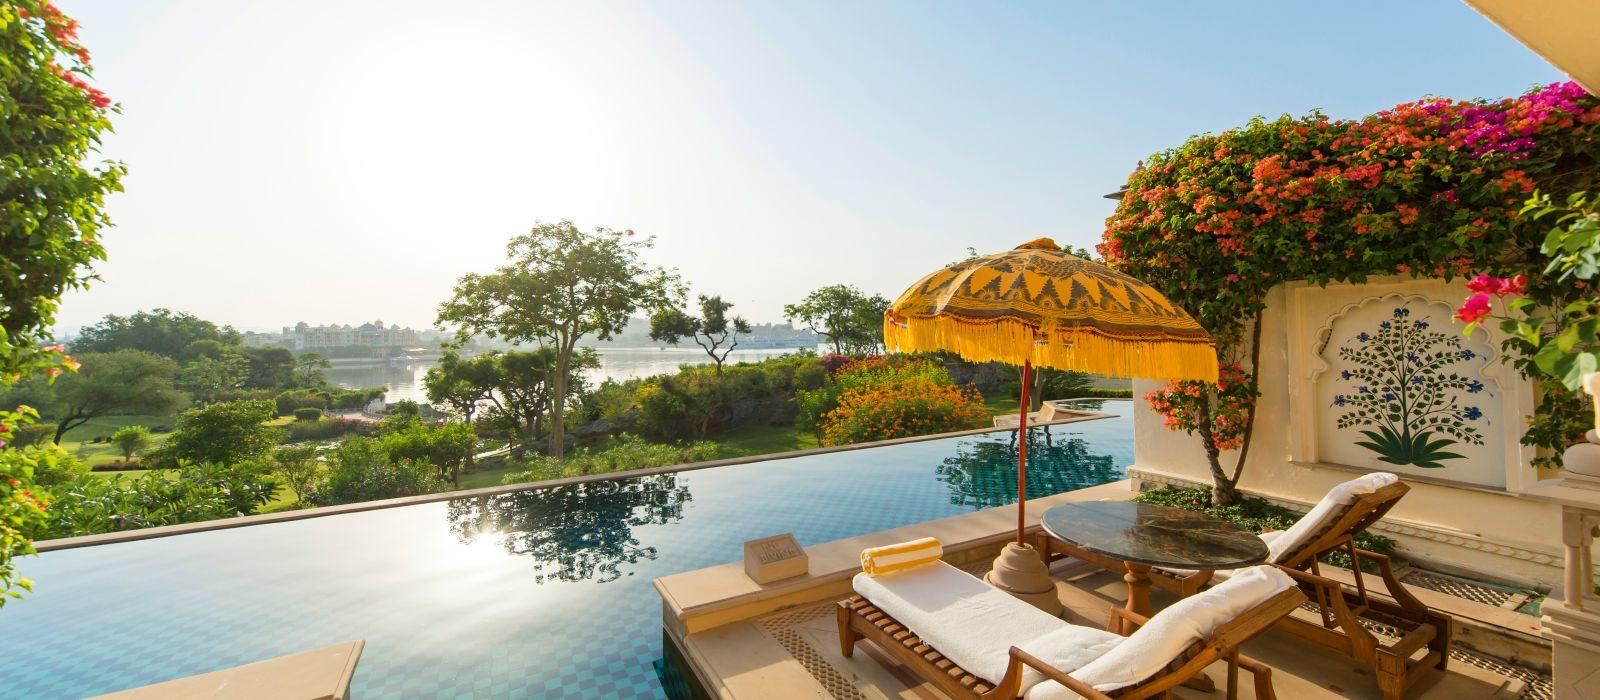 The Oberoi Hotels & Resorts Sommerangebot: Royales Rajasthan Urlaub 5